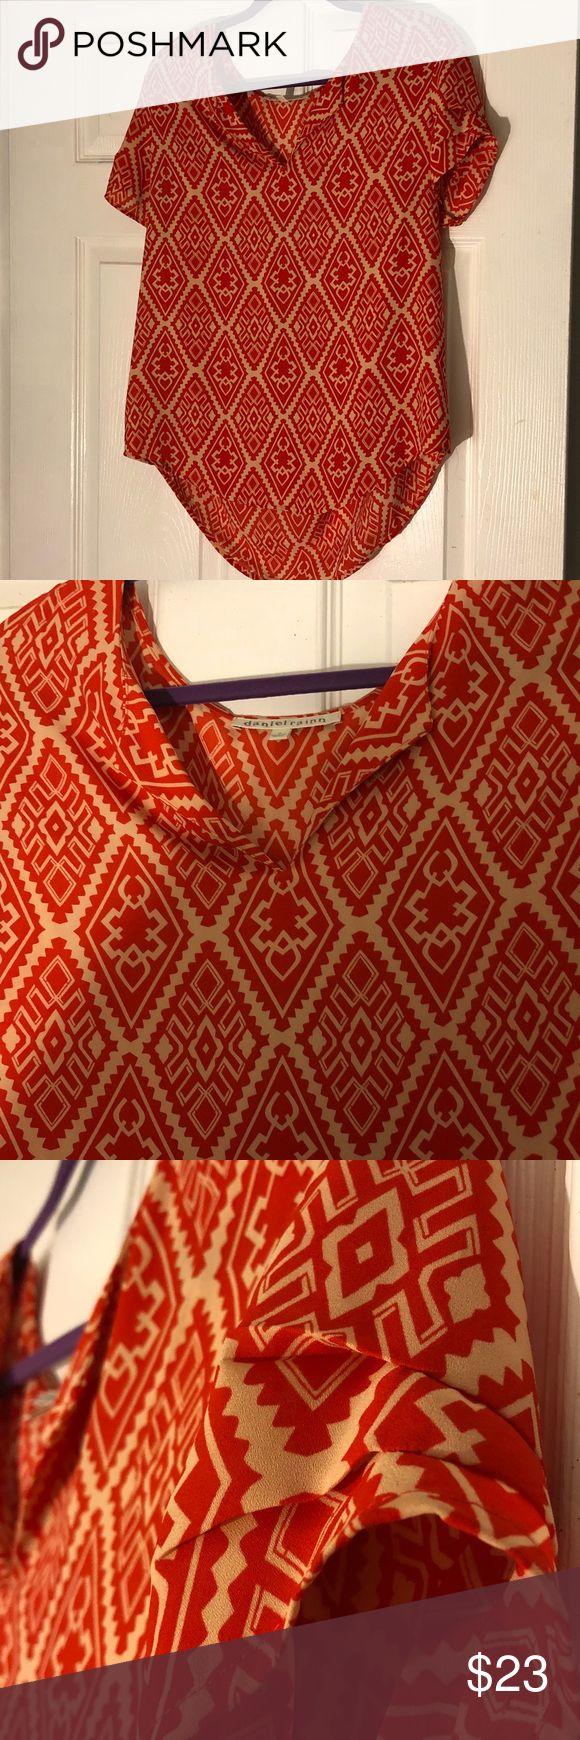 Daniel Rainn blouse. Daniel Rainn short sleeve Aztec blouse. Size M. Red has somewhat of an orange hue. Daniel Rainn Tops Blouses